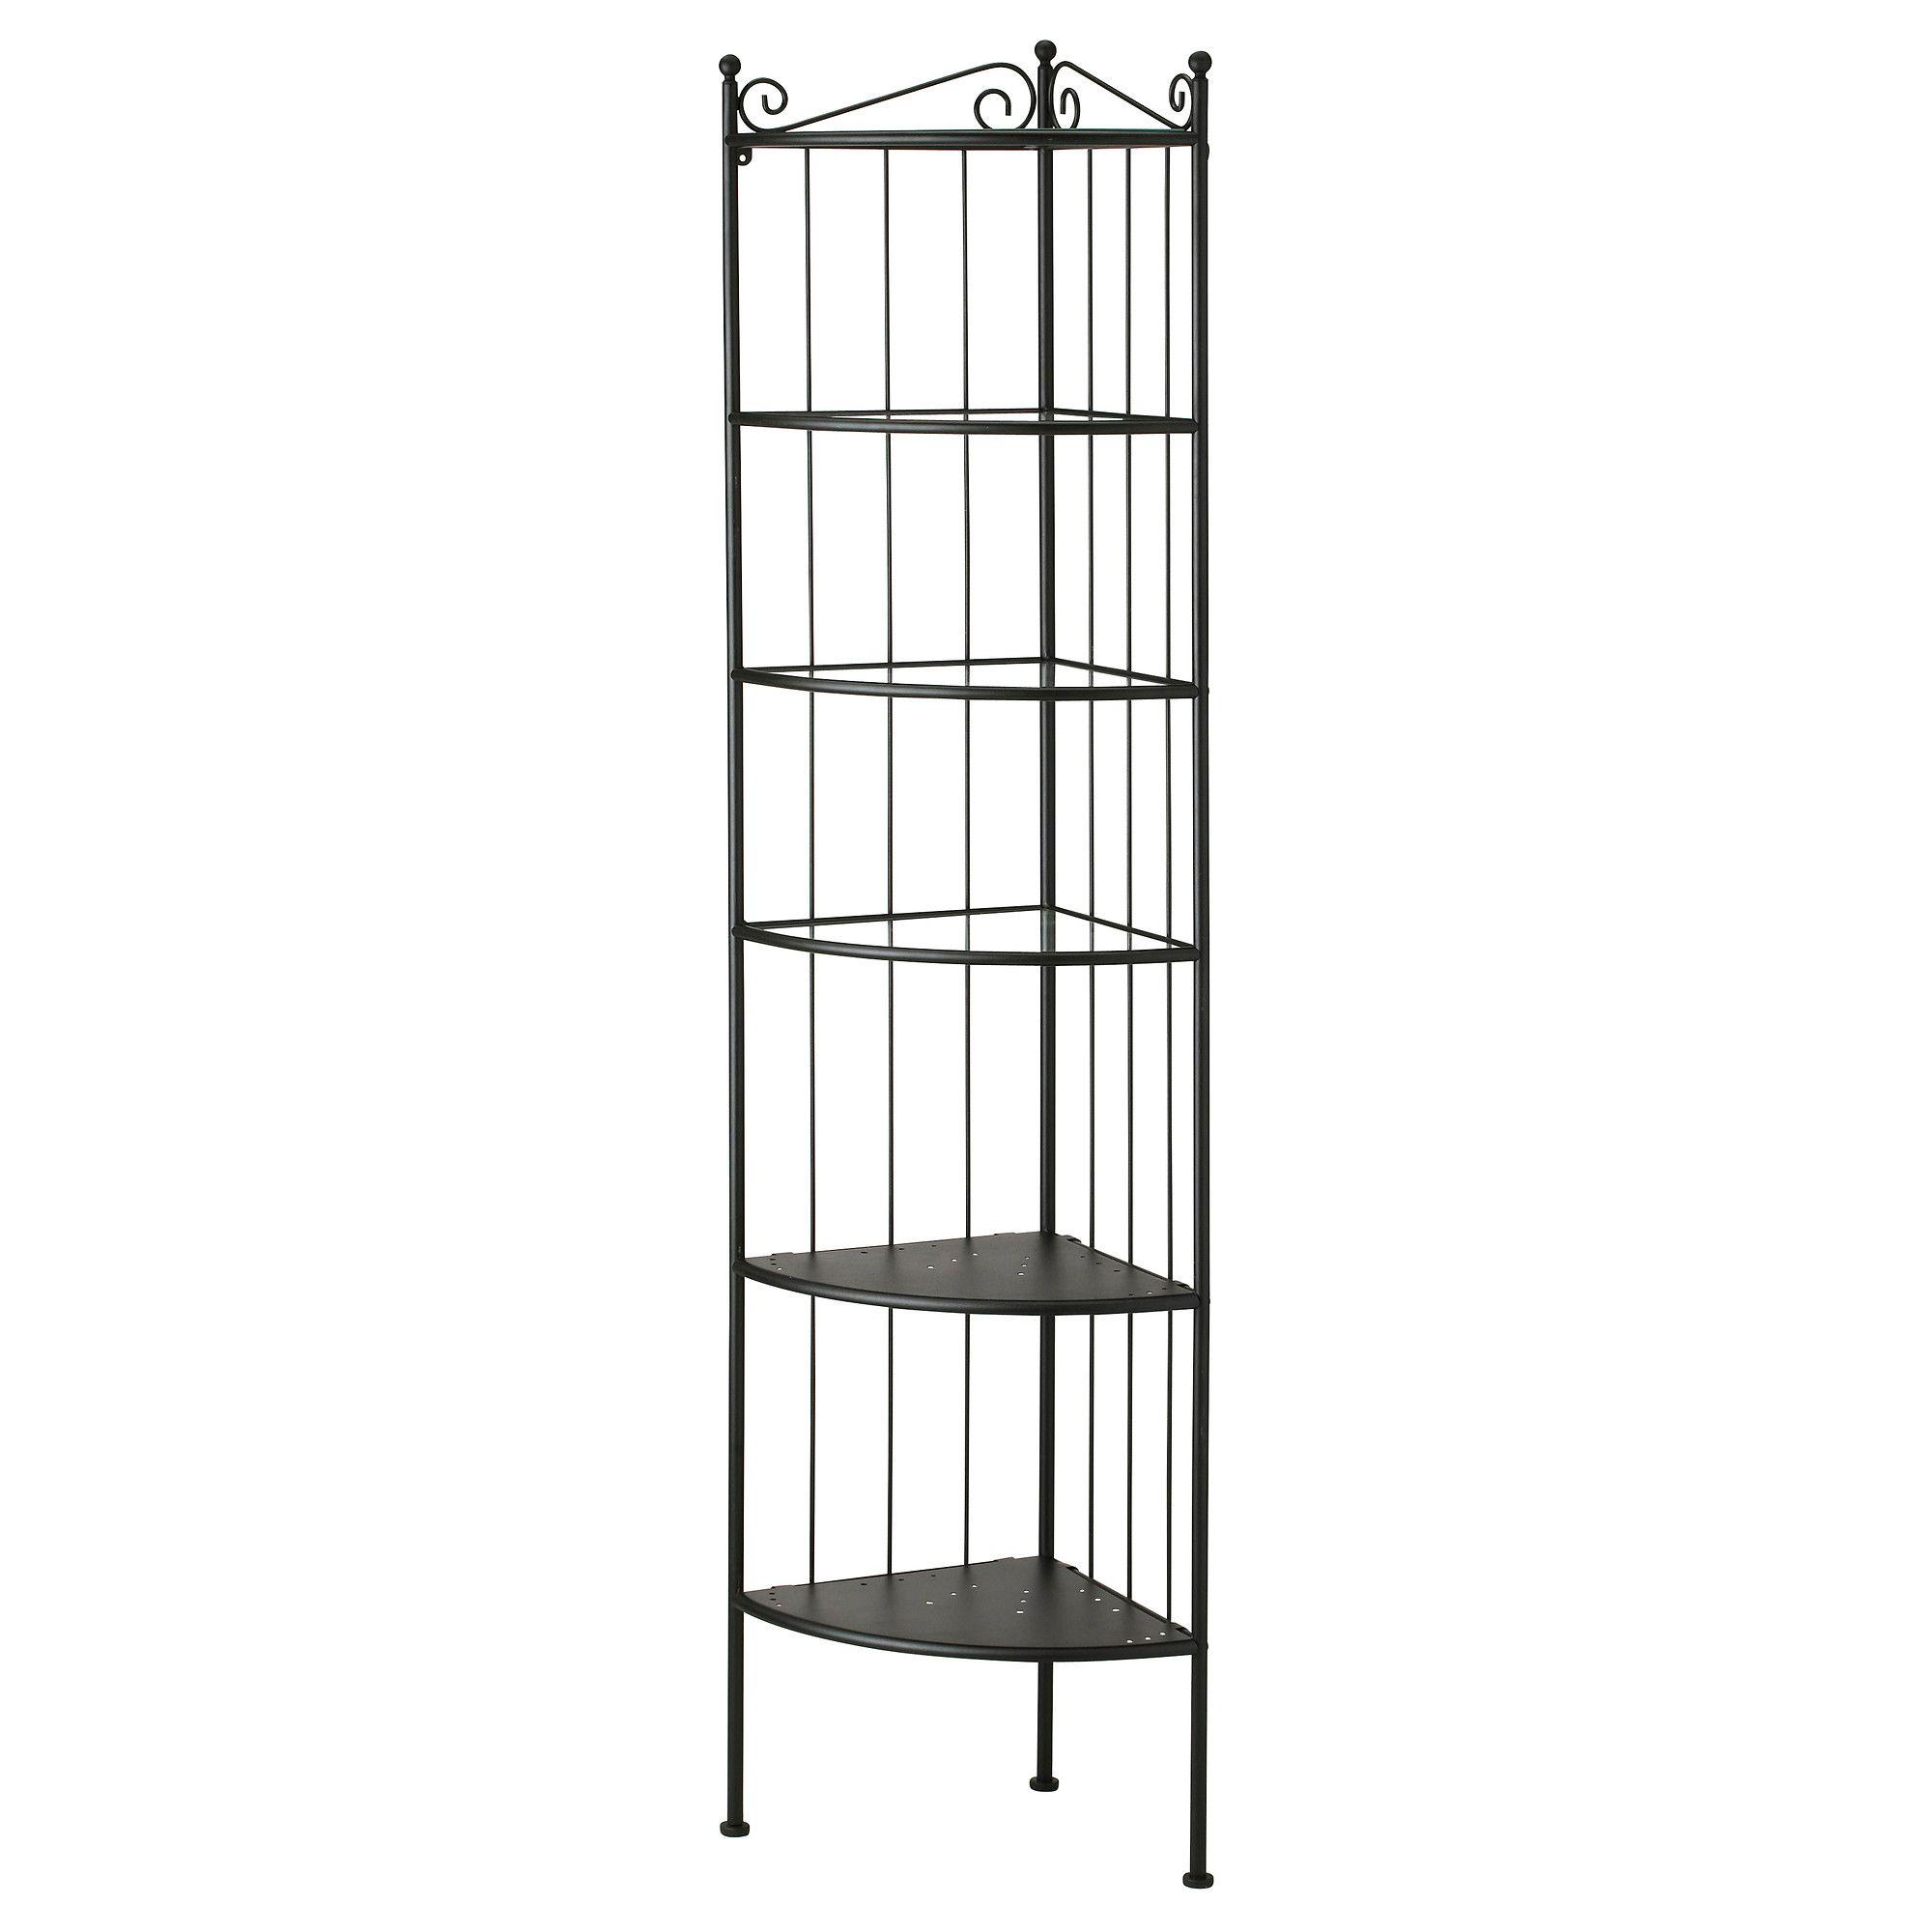 Ronnskar Corner Shelf Unit Black Badezimmer Eckregal Eckregal